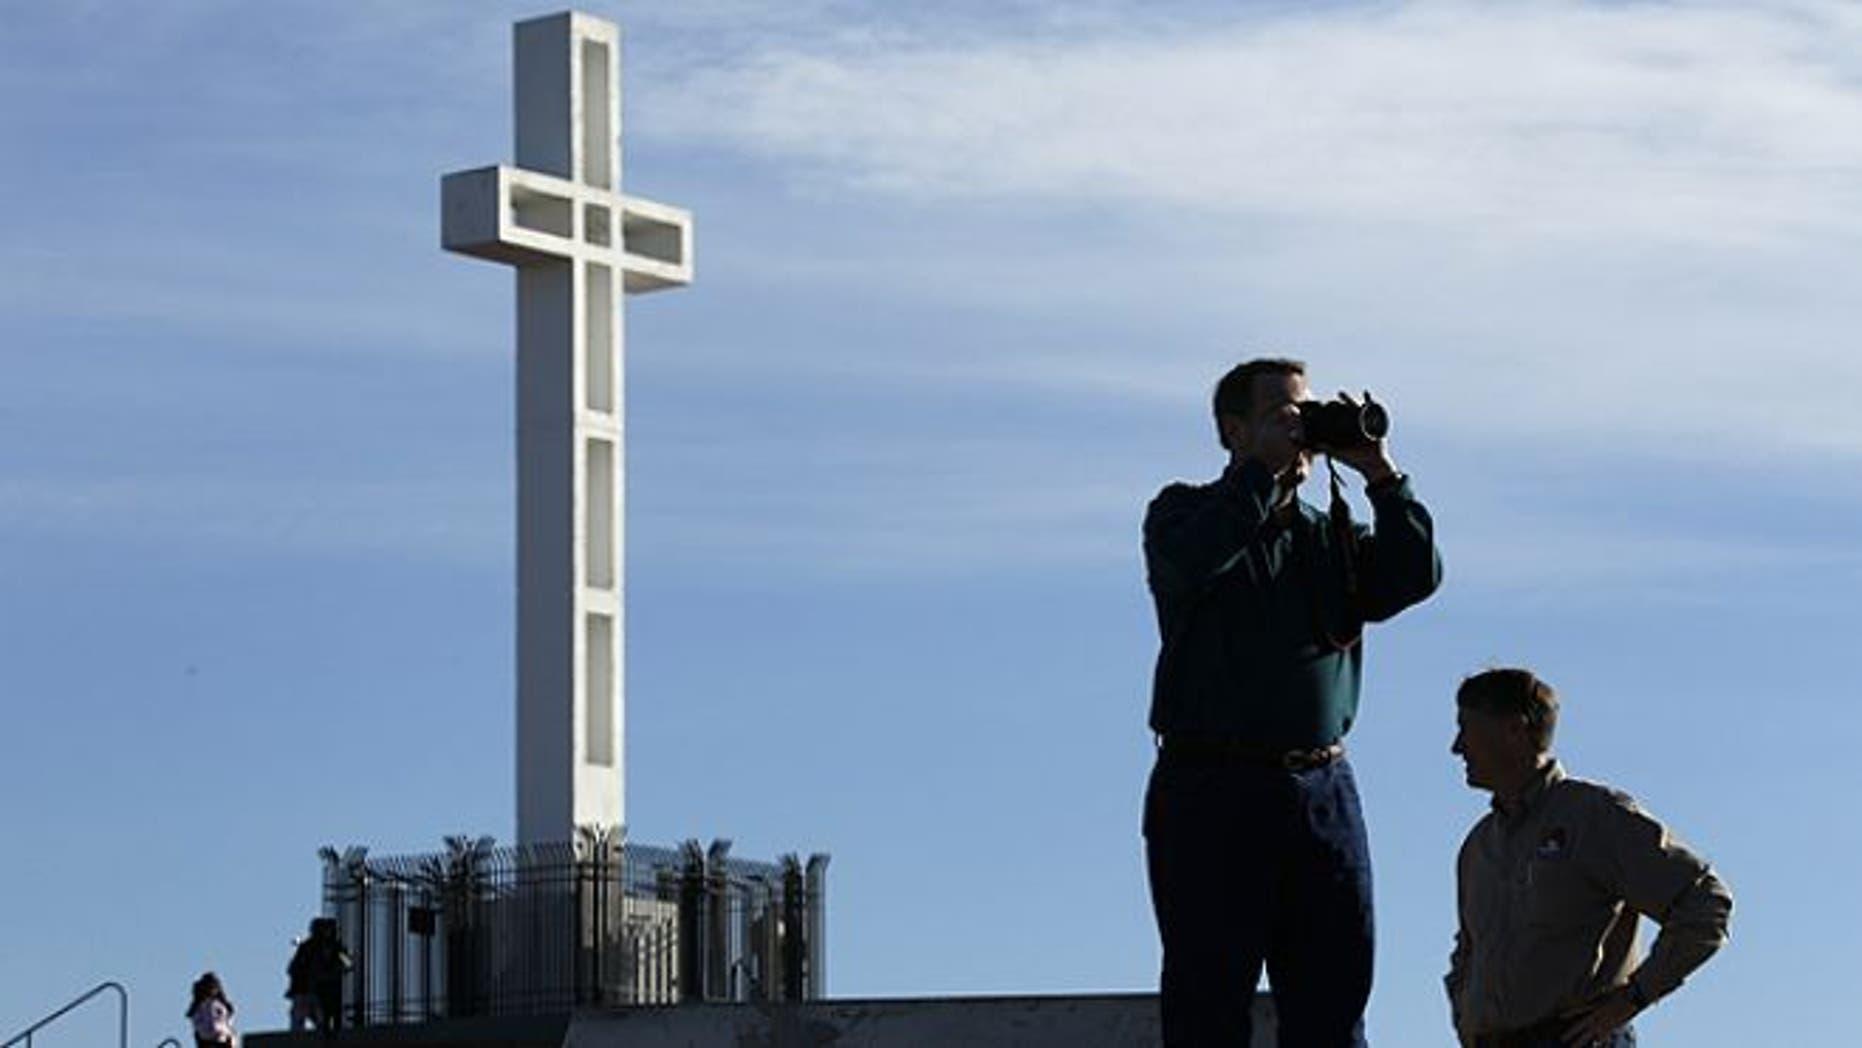 FILE: Jan. 4, 2011: Rev. John Fredericksen of Orlando, Fla., takes a picture in front of the war memorial cross on Mount Soledad in San Diego, alongside Burdette Streeter of San Diego.